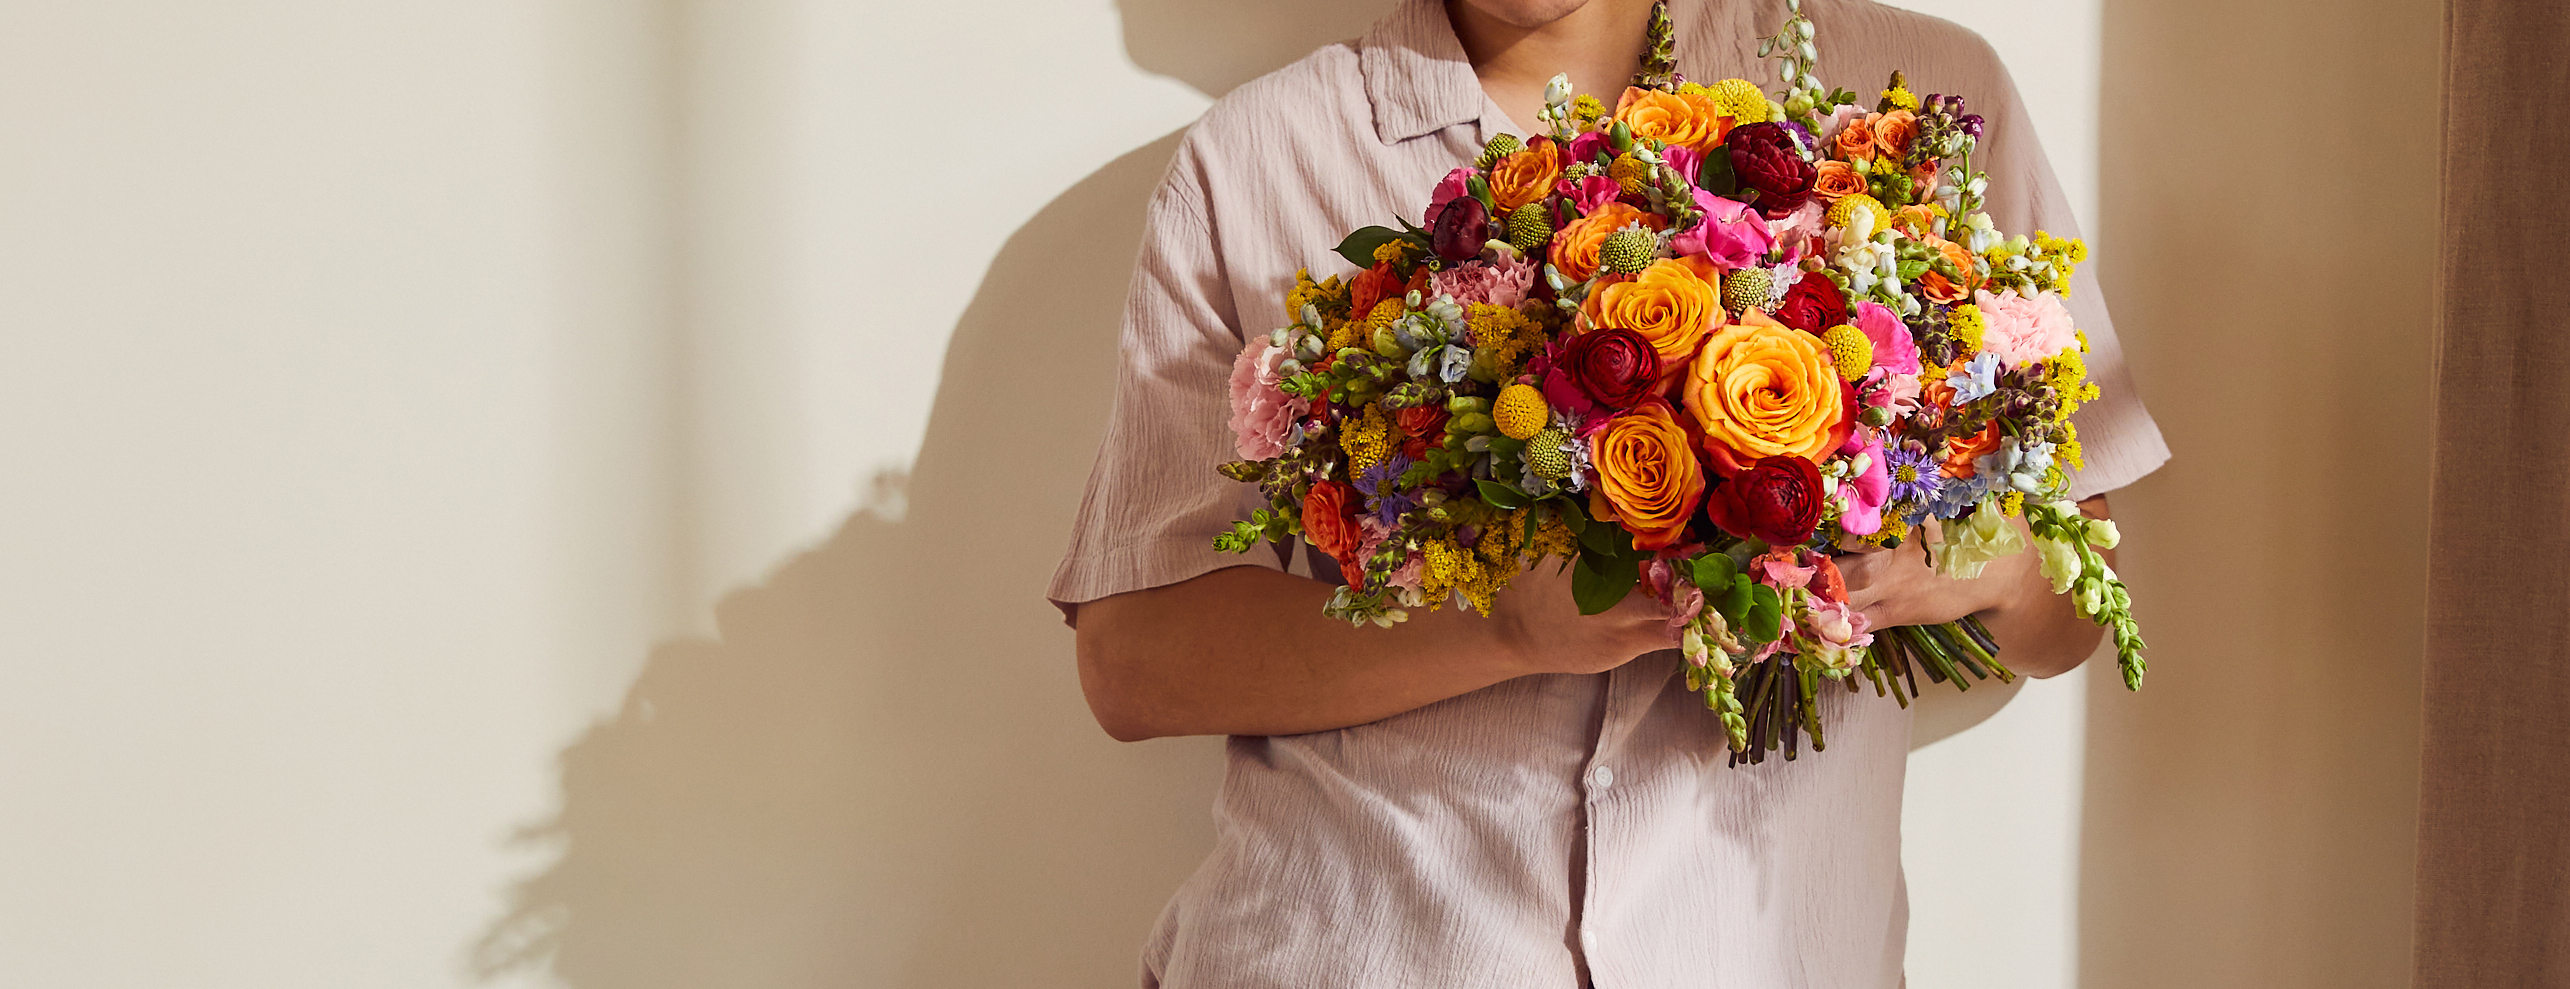 Person holding rainbow flower bouquet